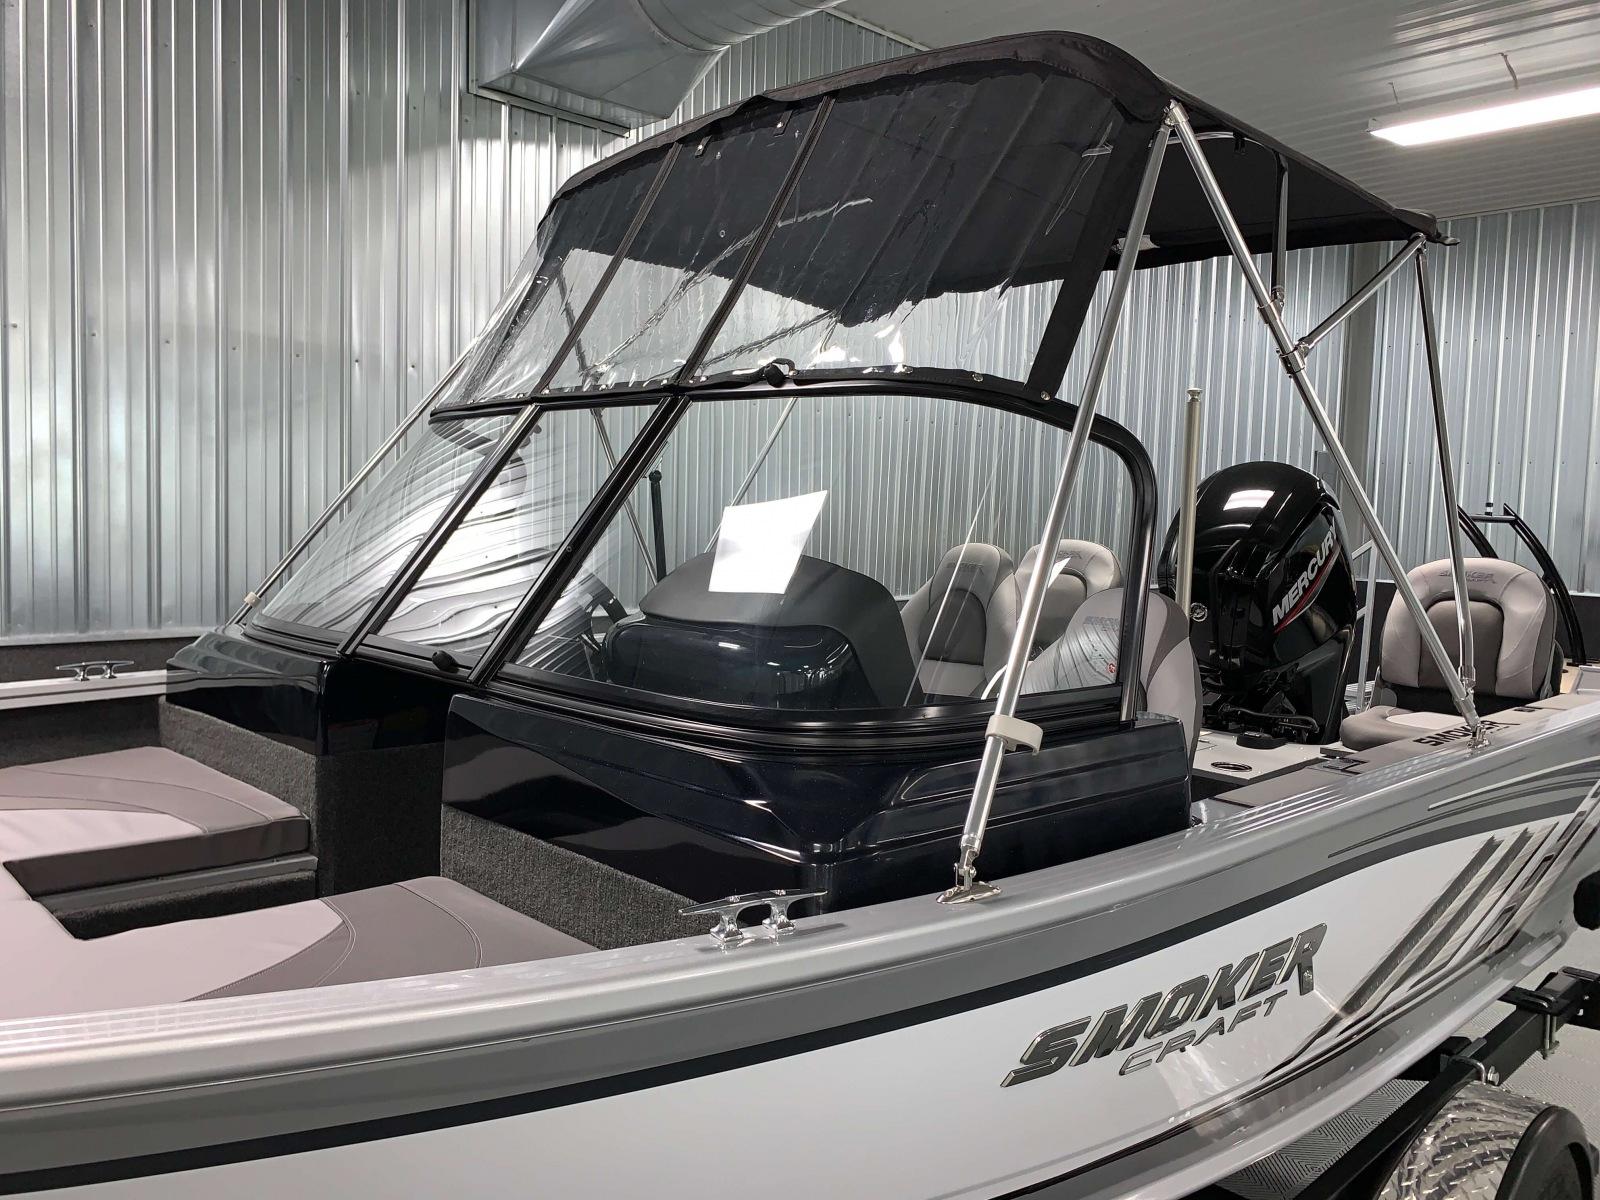 Fisherman's Top Visor of a 2021 Smoker Craft 172 Explorer Fish And Ski Boat